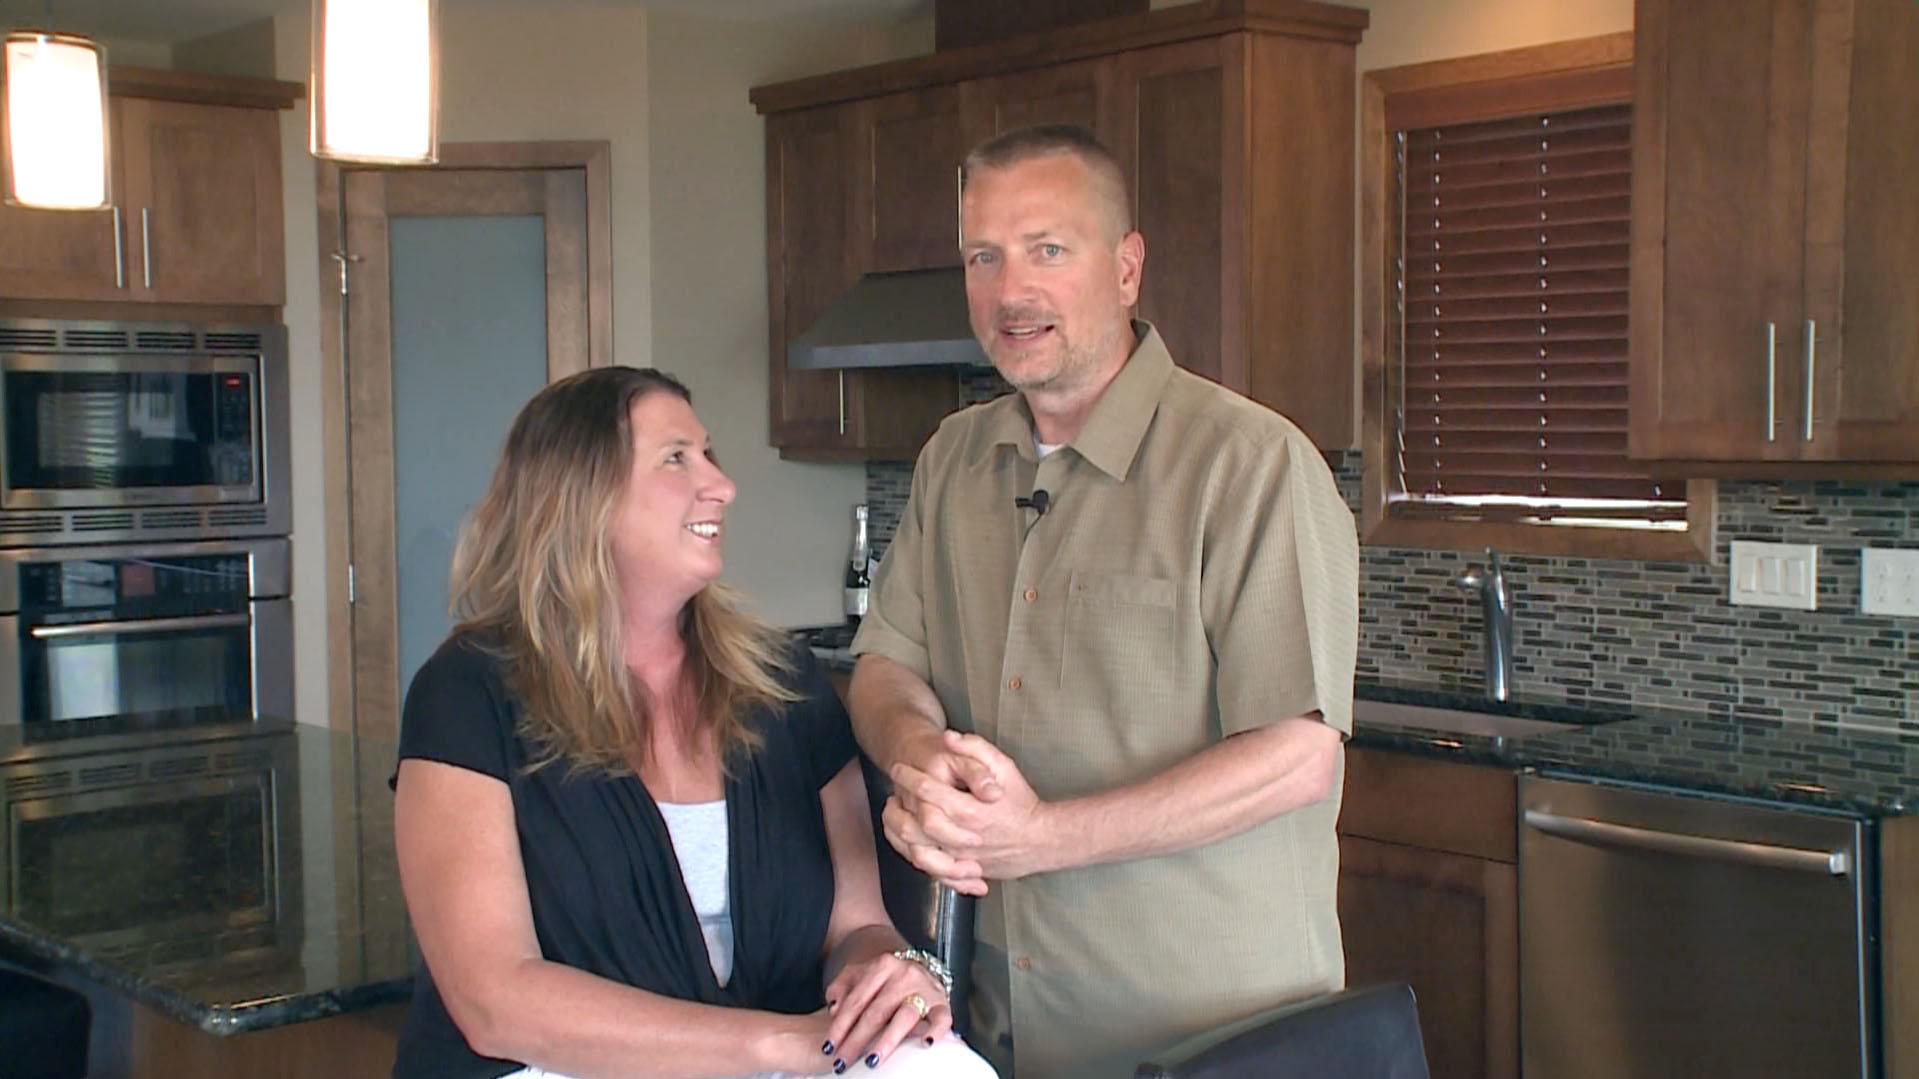 Treated Like Family – Joe & Paulette F. Testimonial